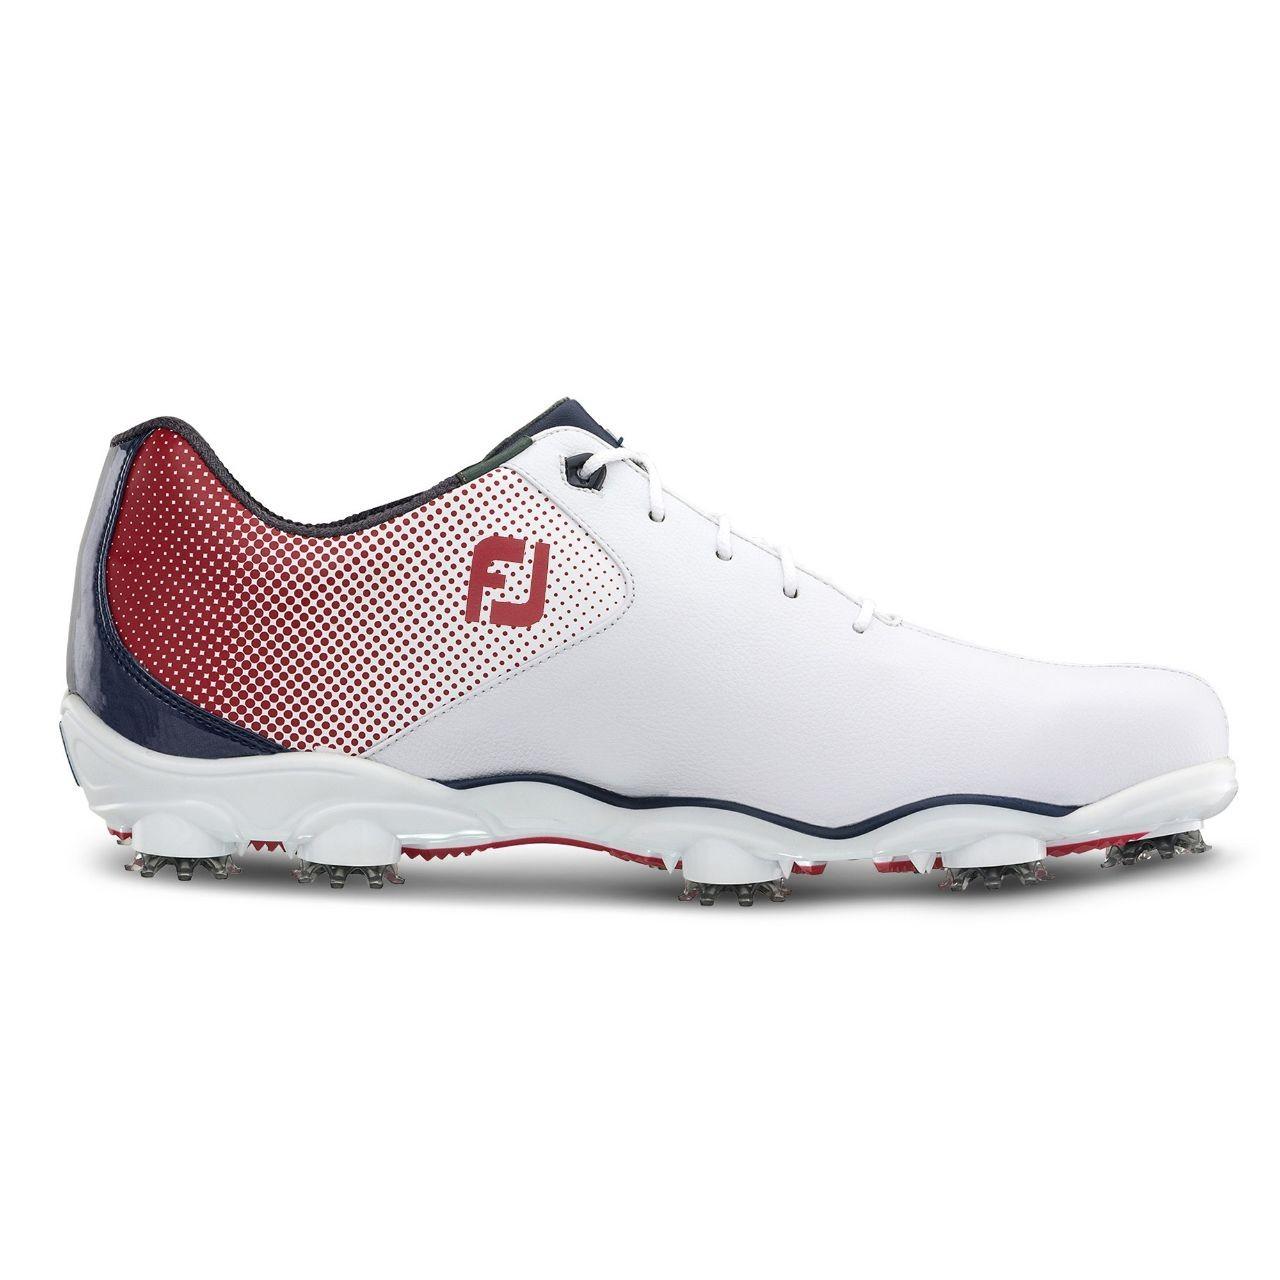 Nike Air Zoom Direct Golfschuh Damen weiß/schwarz EU 36 1/2 NFNVJoO